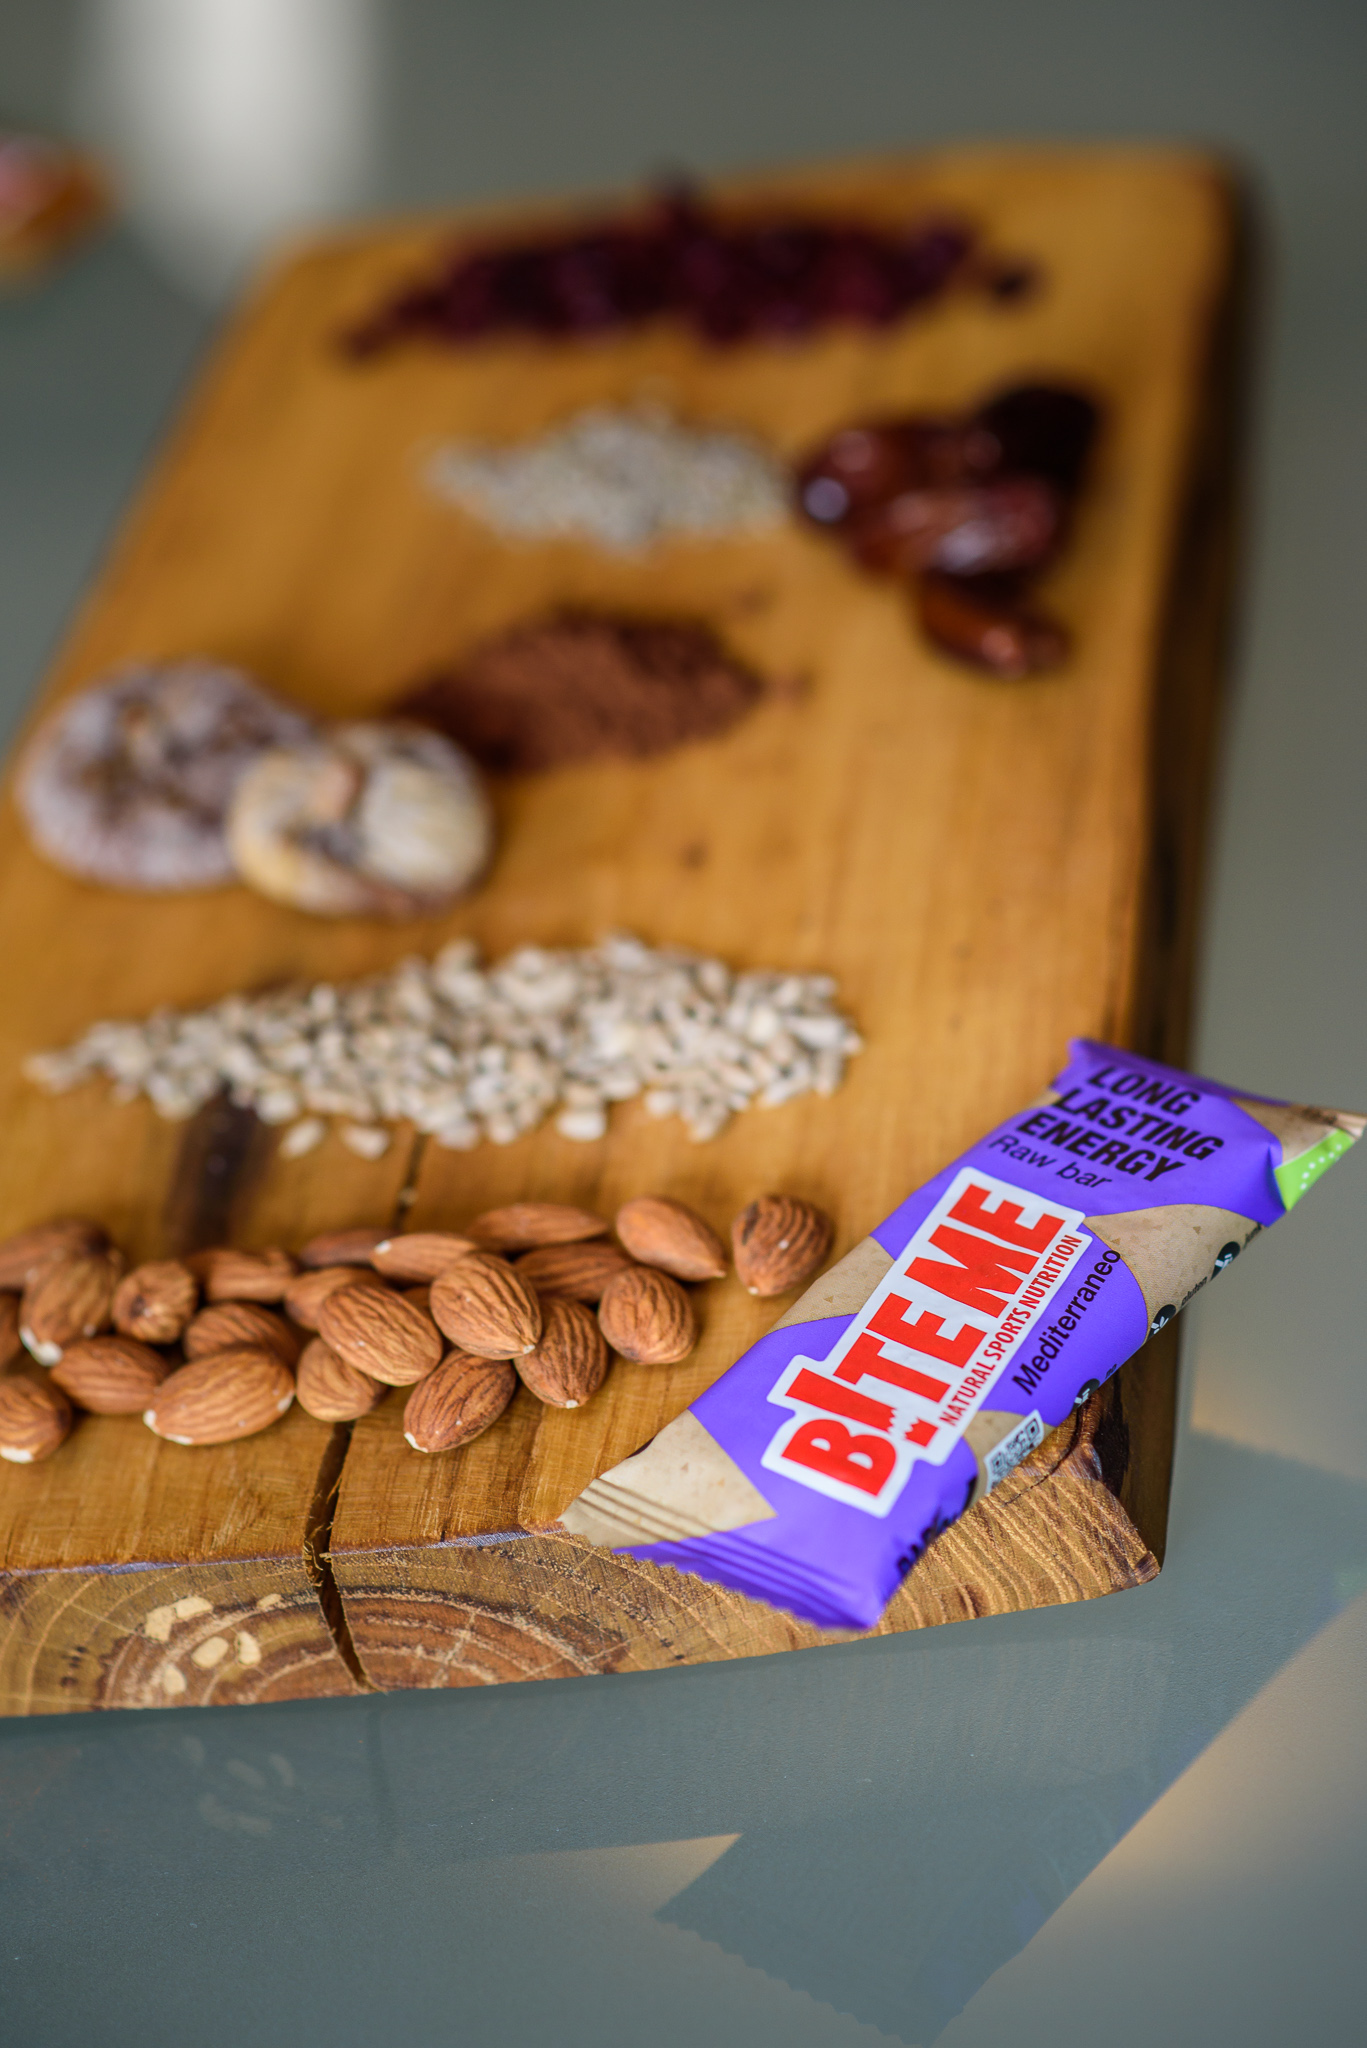 B!TE ME NUTRITION predstavio proizvode prirodne prehrane za sportaše i rekreativce